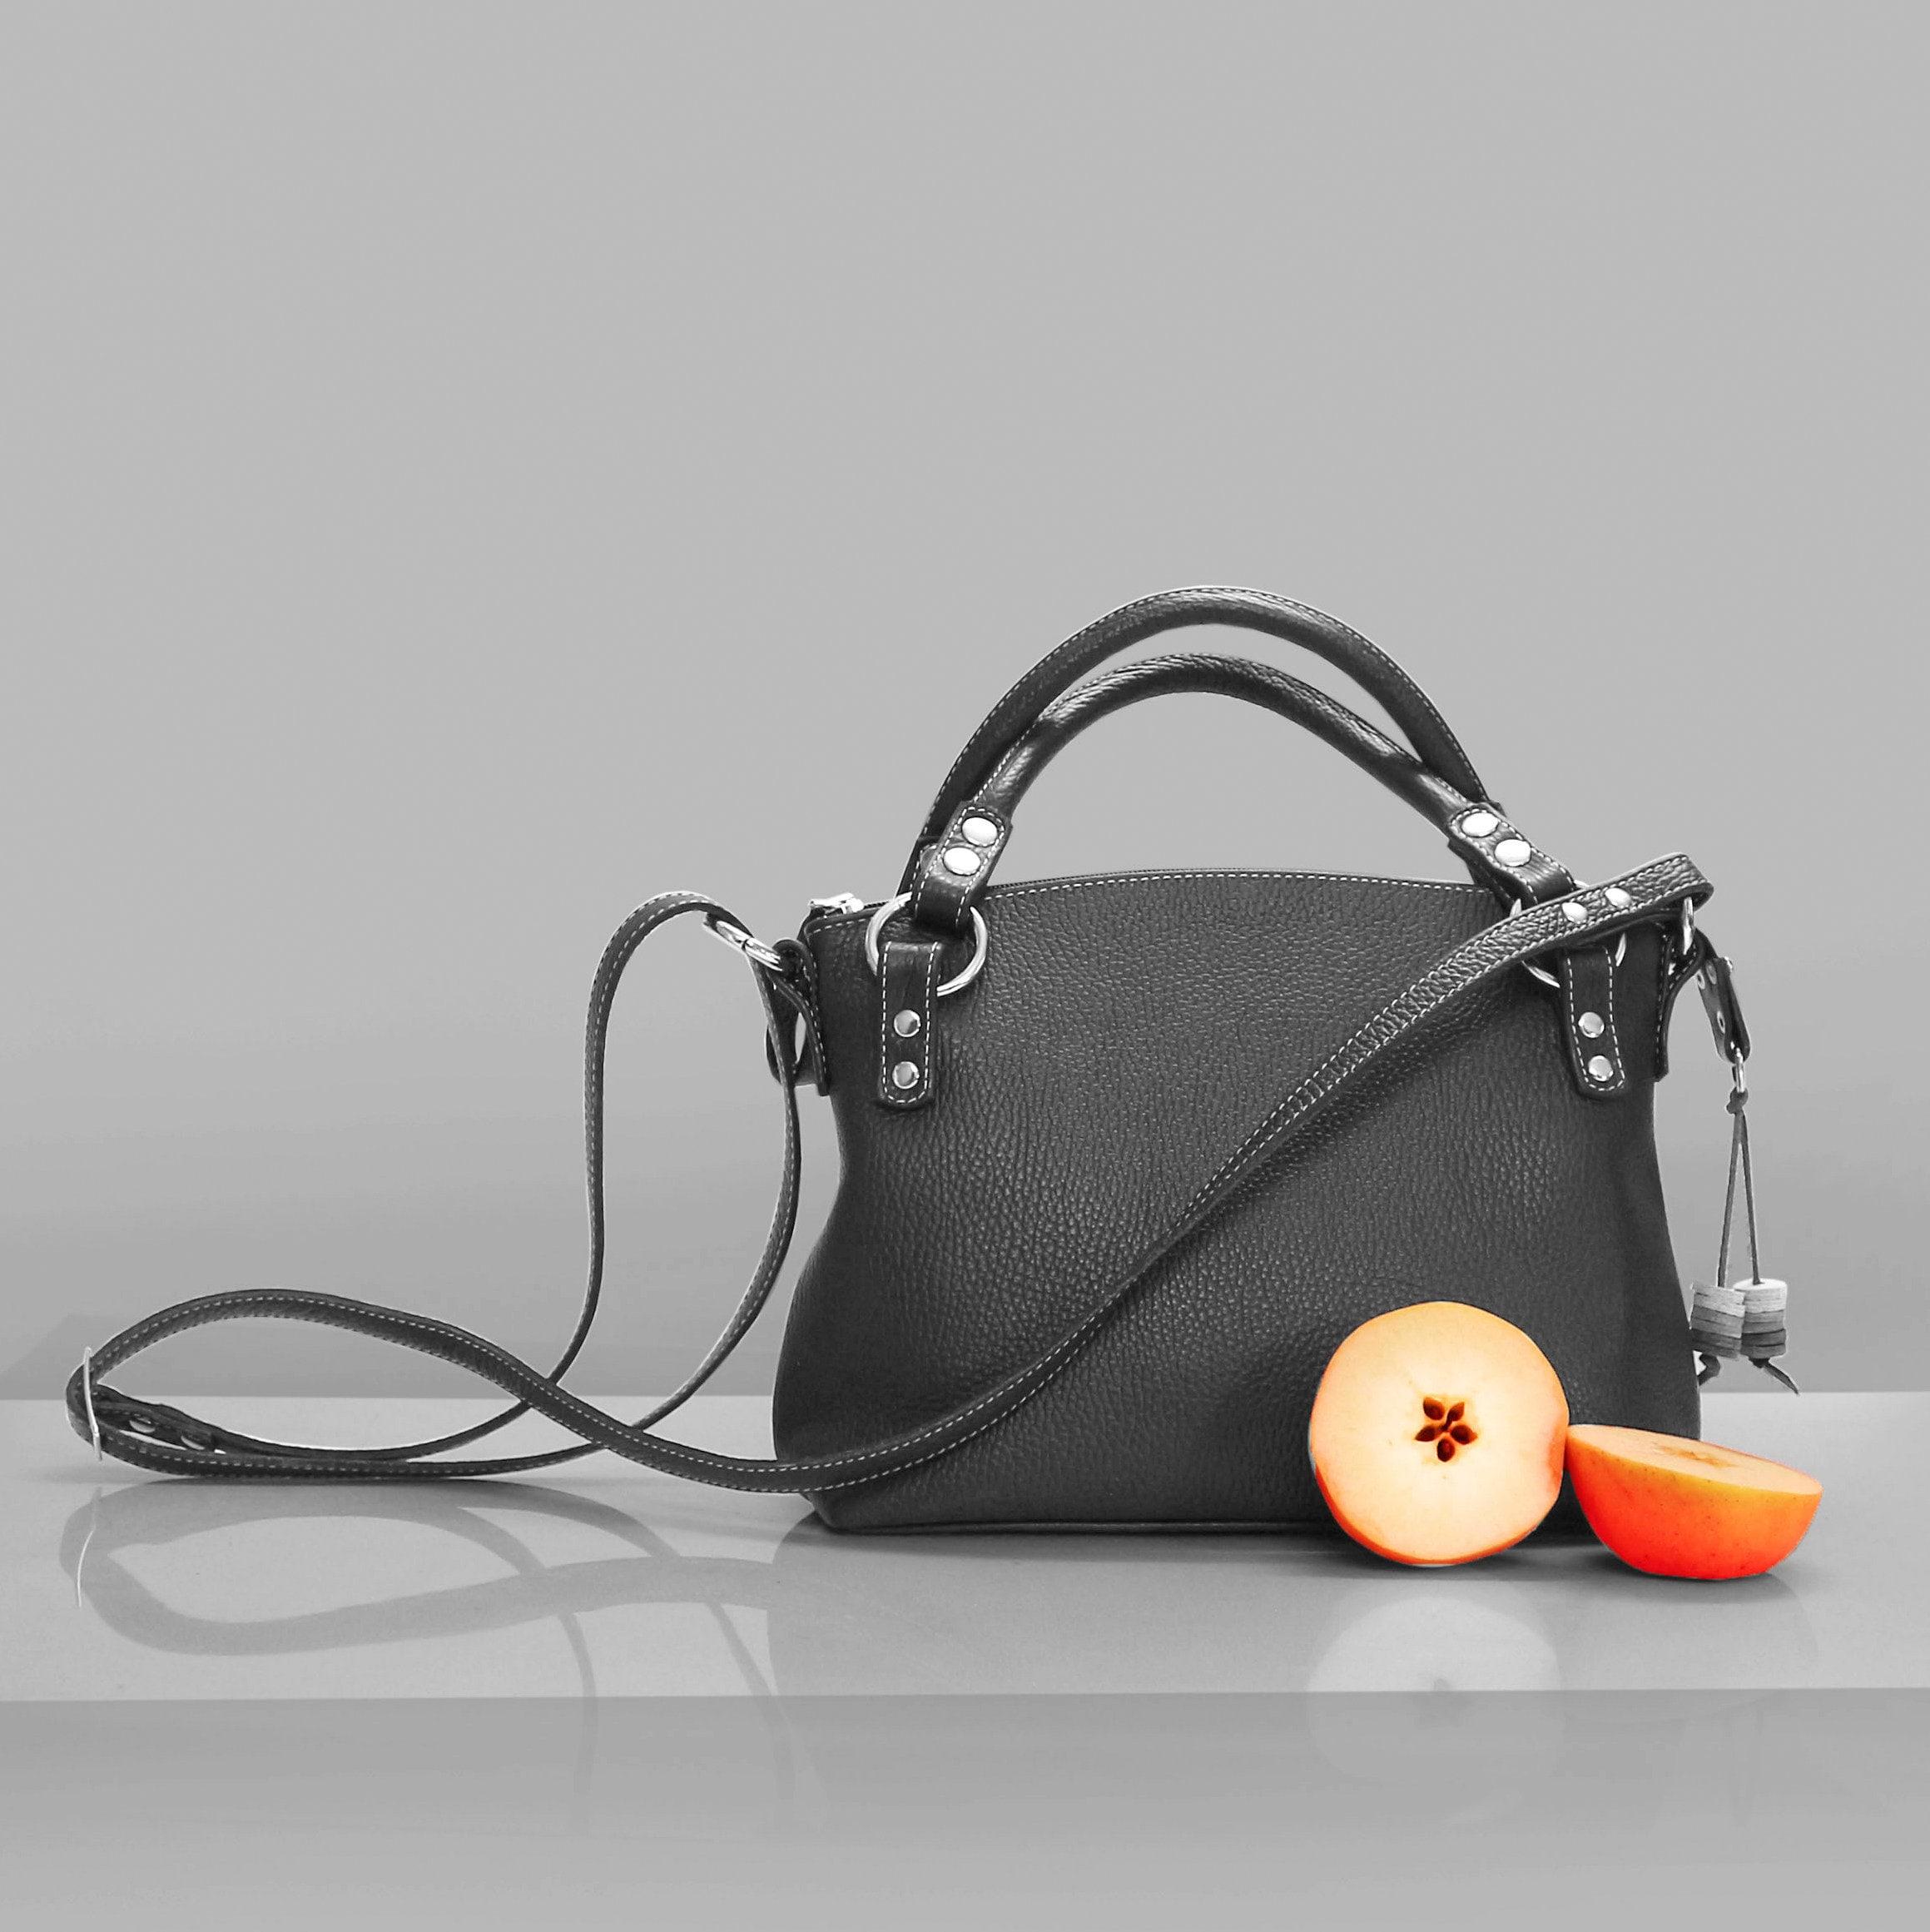 Leather bag charm 7 pendant zipper pull handbag decoration molded handpainted leather orchid